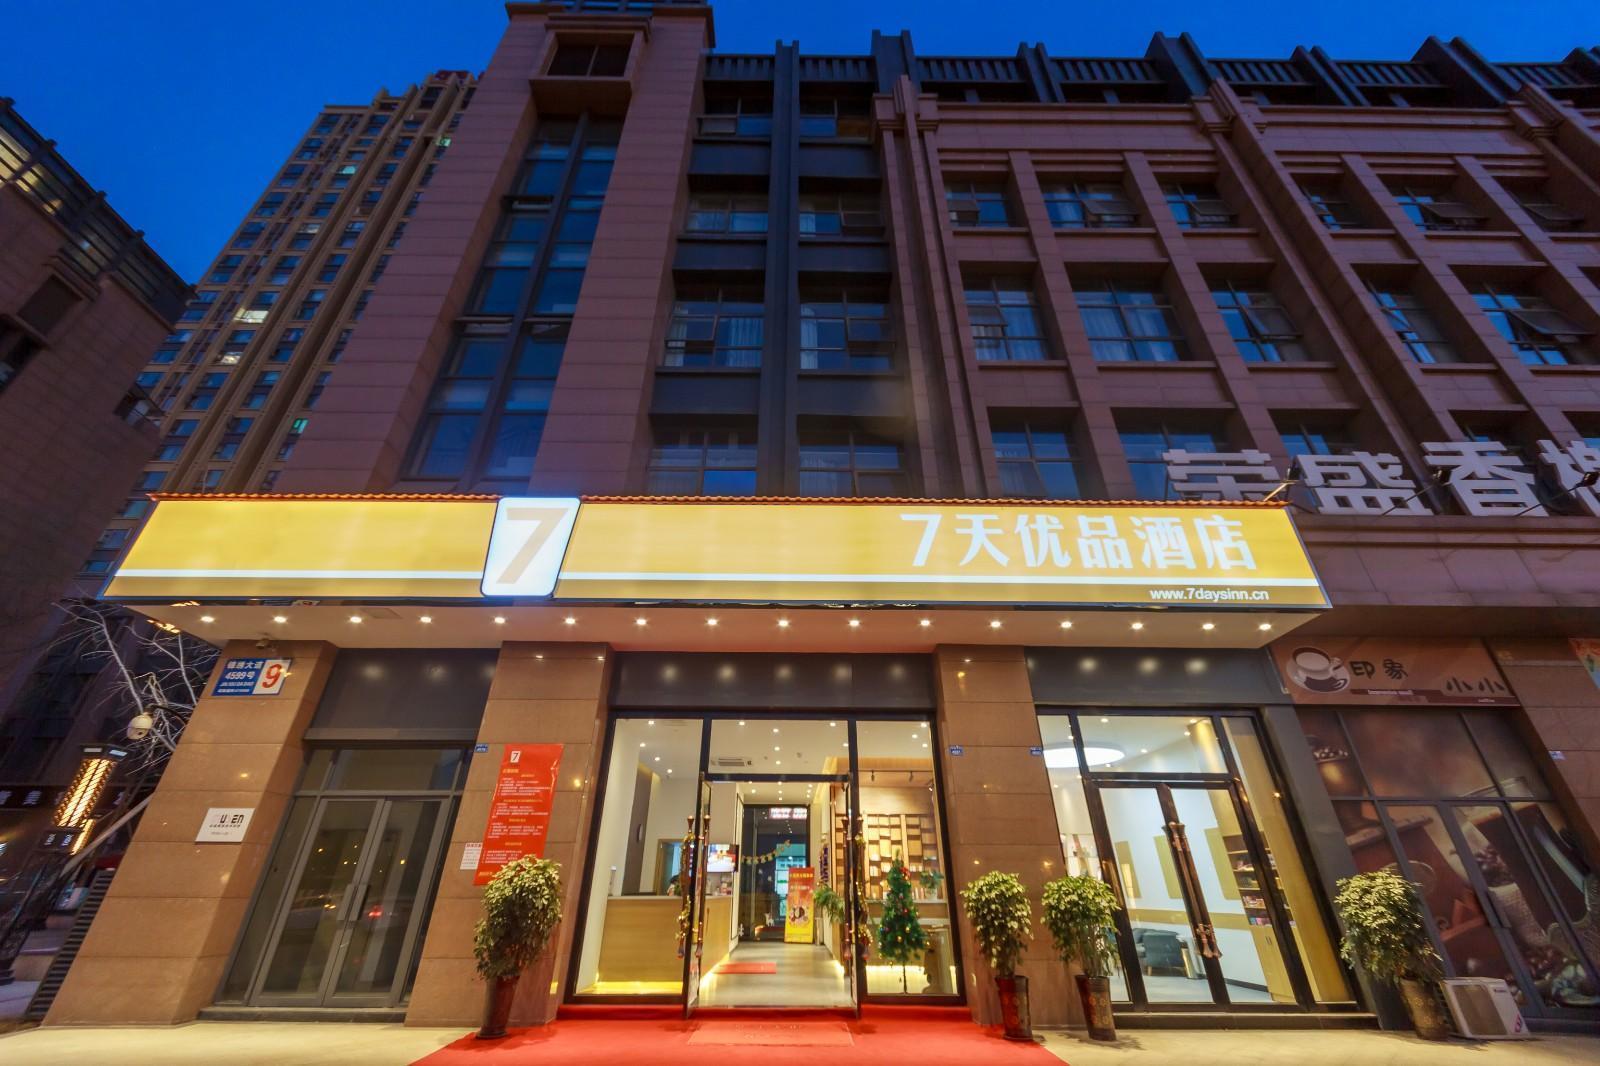 7Days Premium Chengdu Railway East Station Branch, Beijing